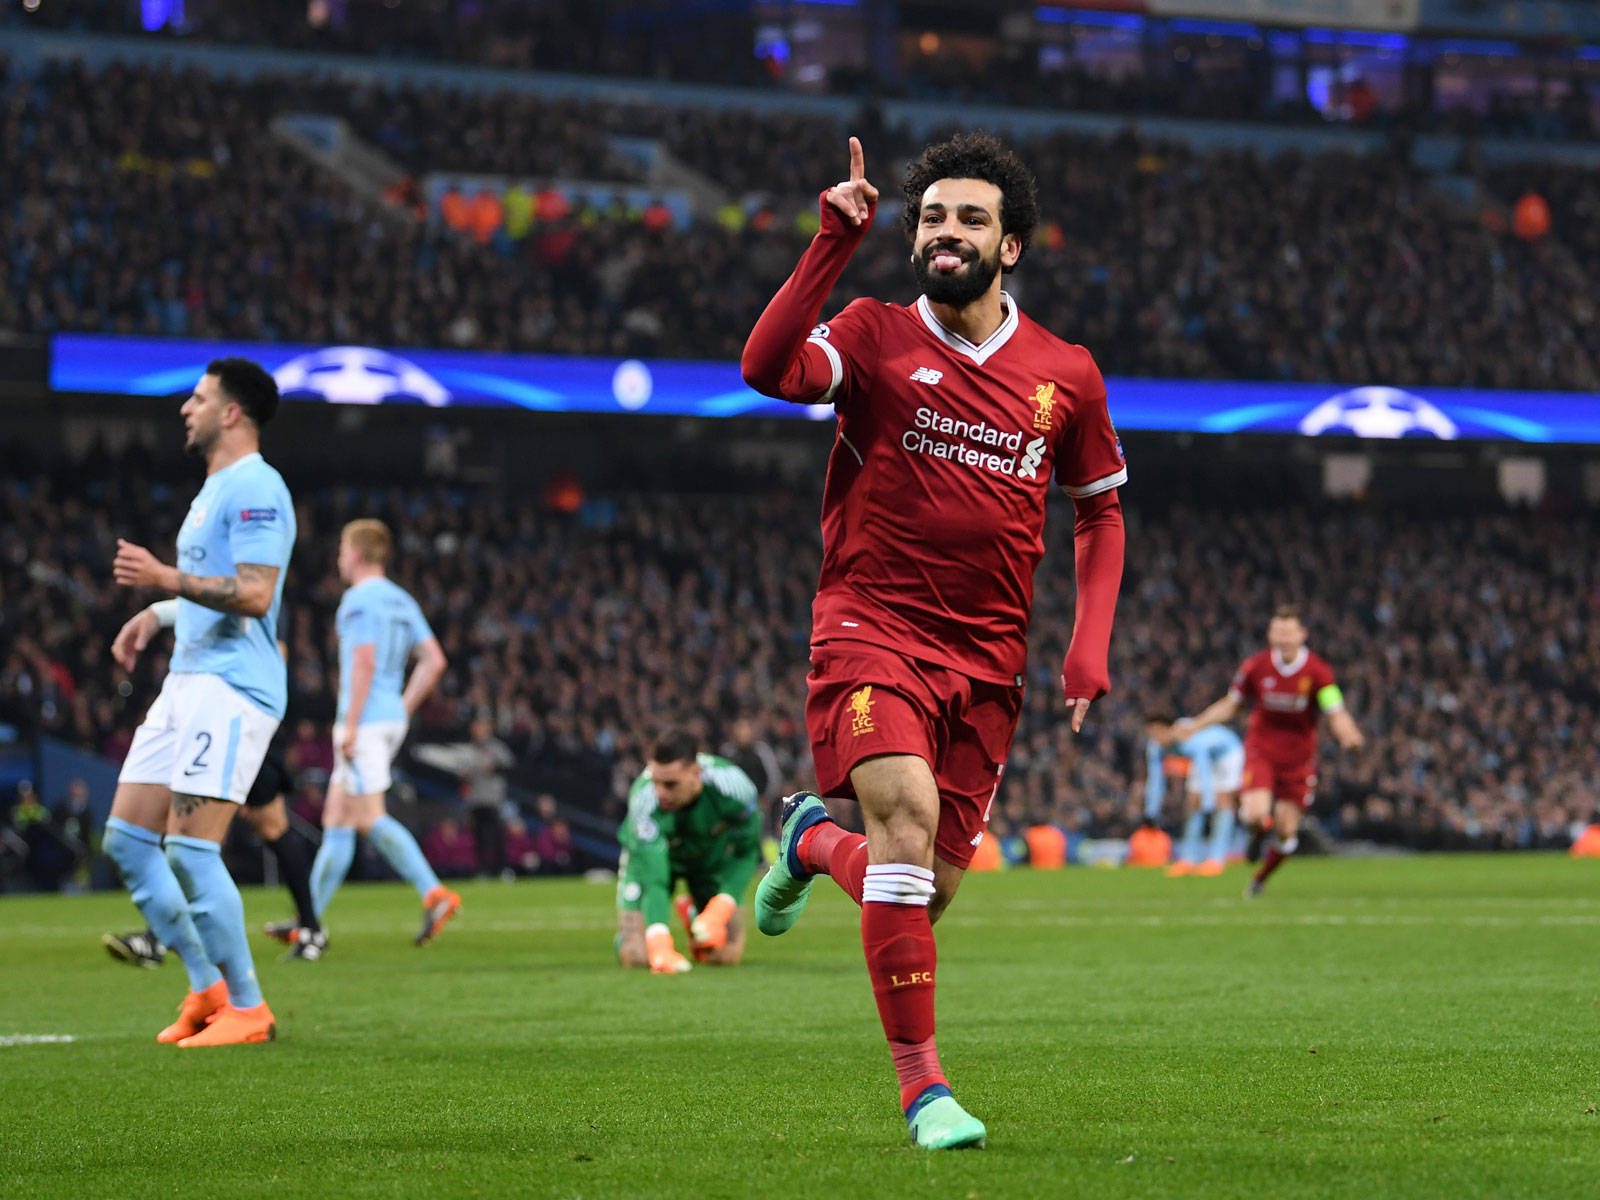 Liverpool hosts Manchester City in a key Premier League clash